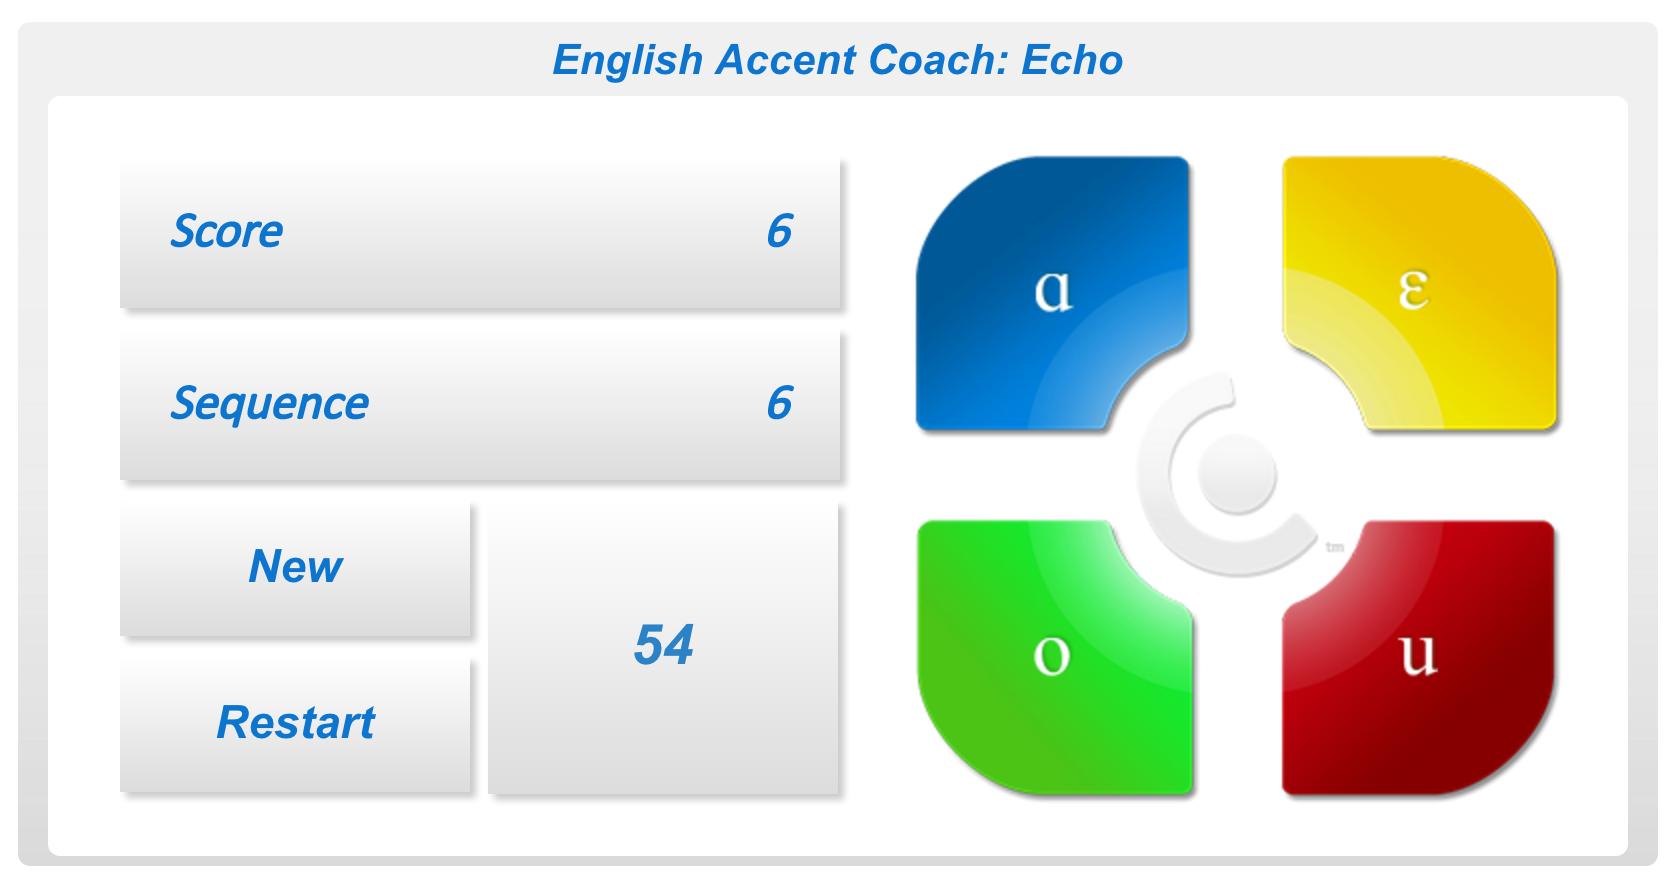 English accent coach figure 3 consonant game figure 4 nvjuhfo Choice Image